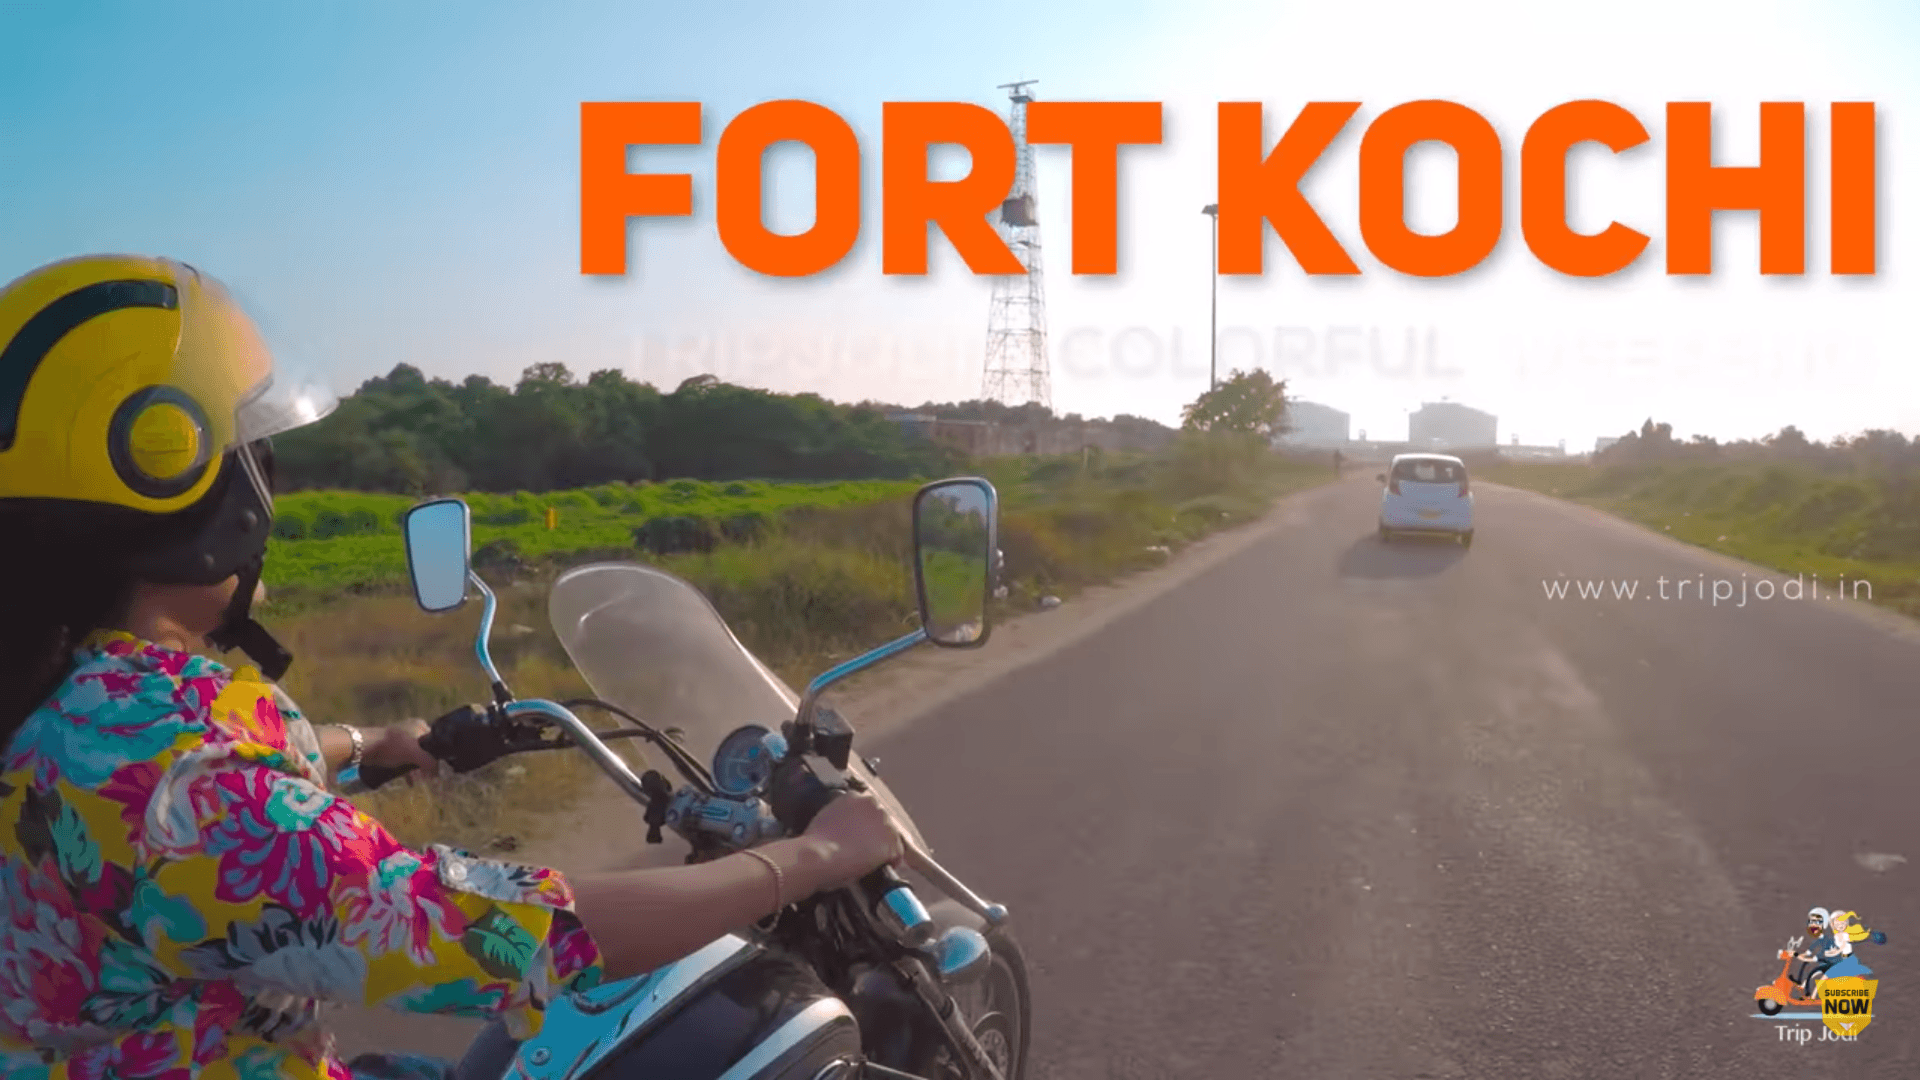 Fort Kochi – Tripjodi's Colourful Weekend Celebration